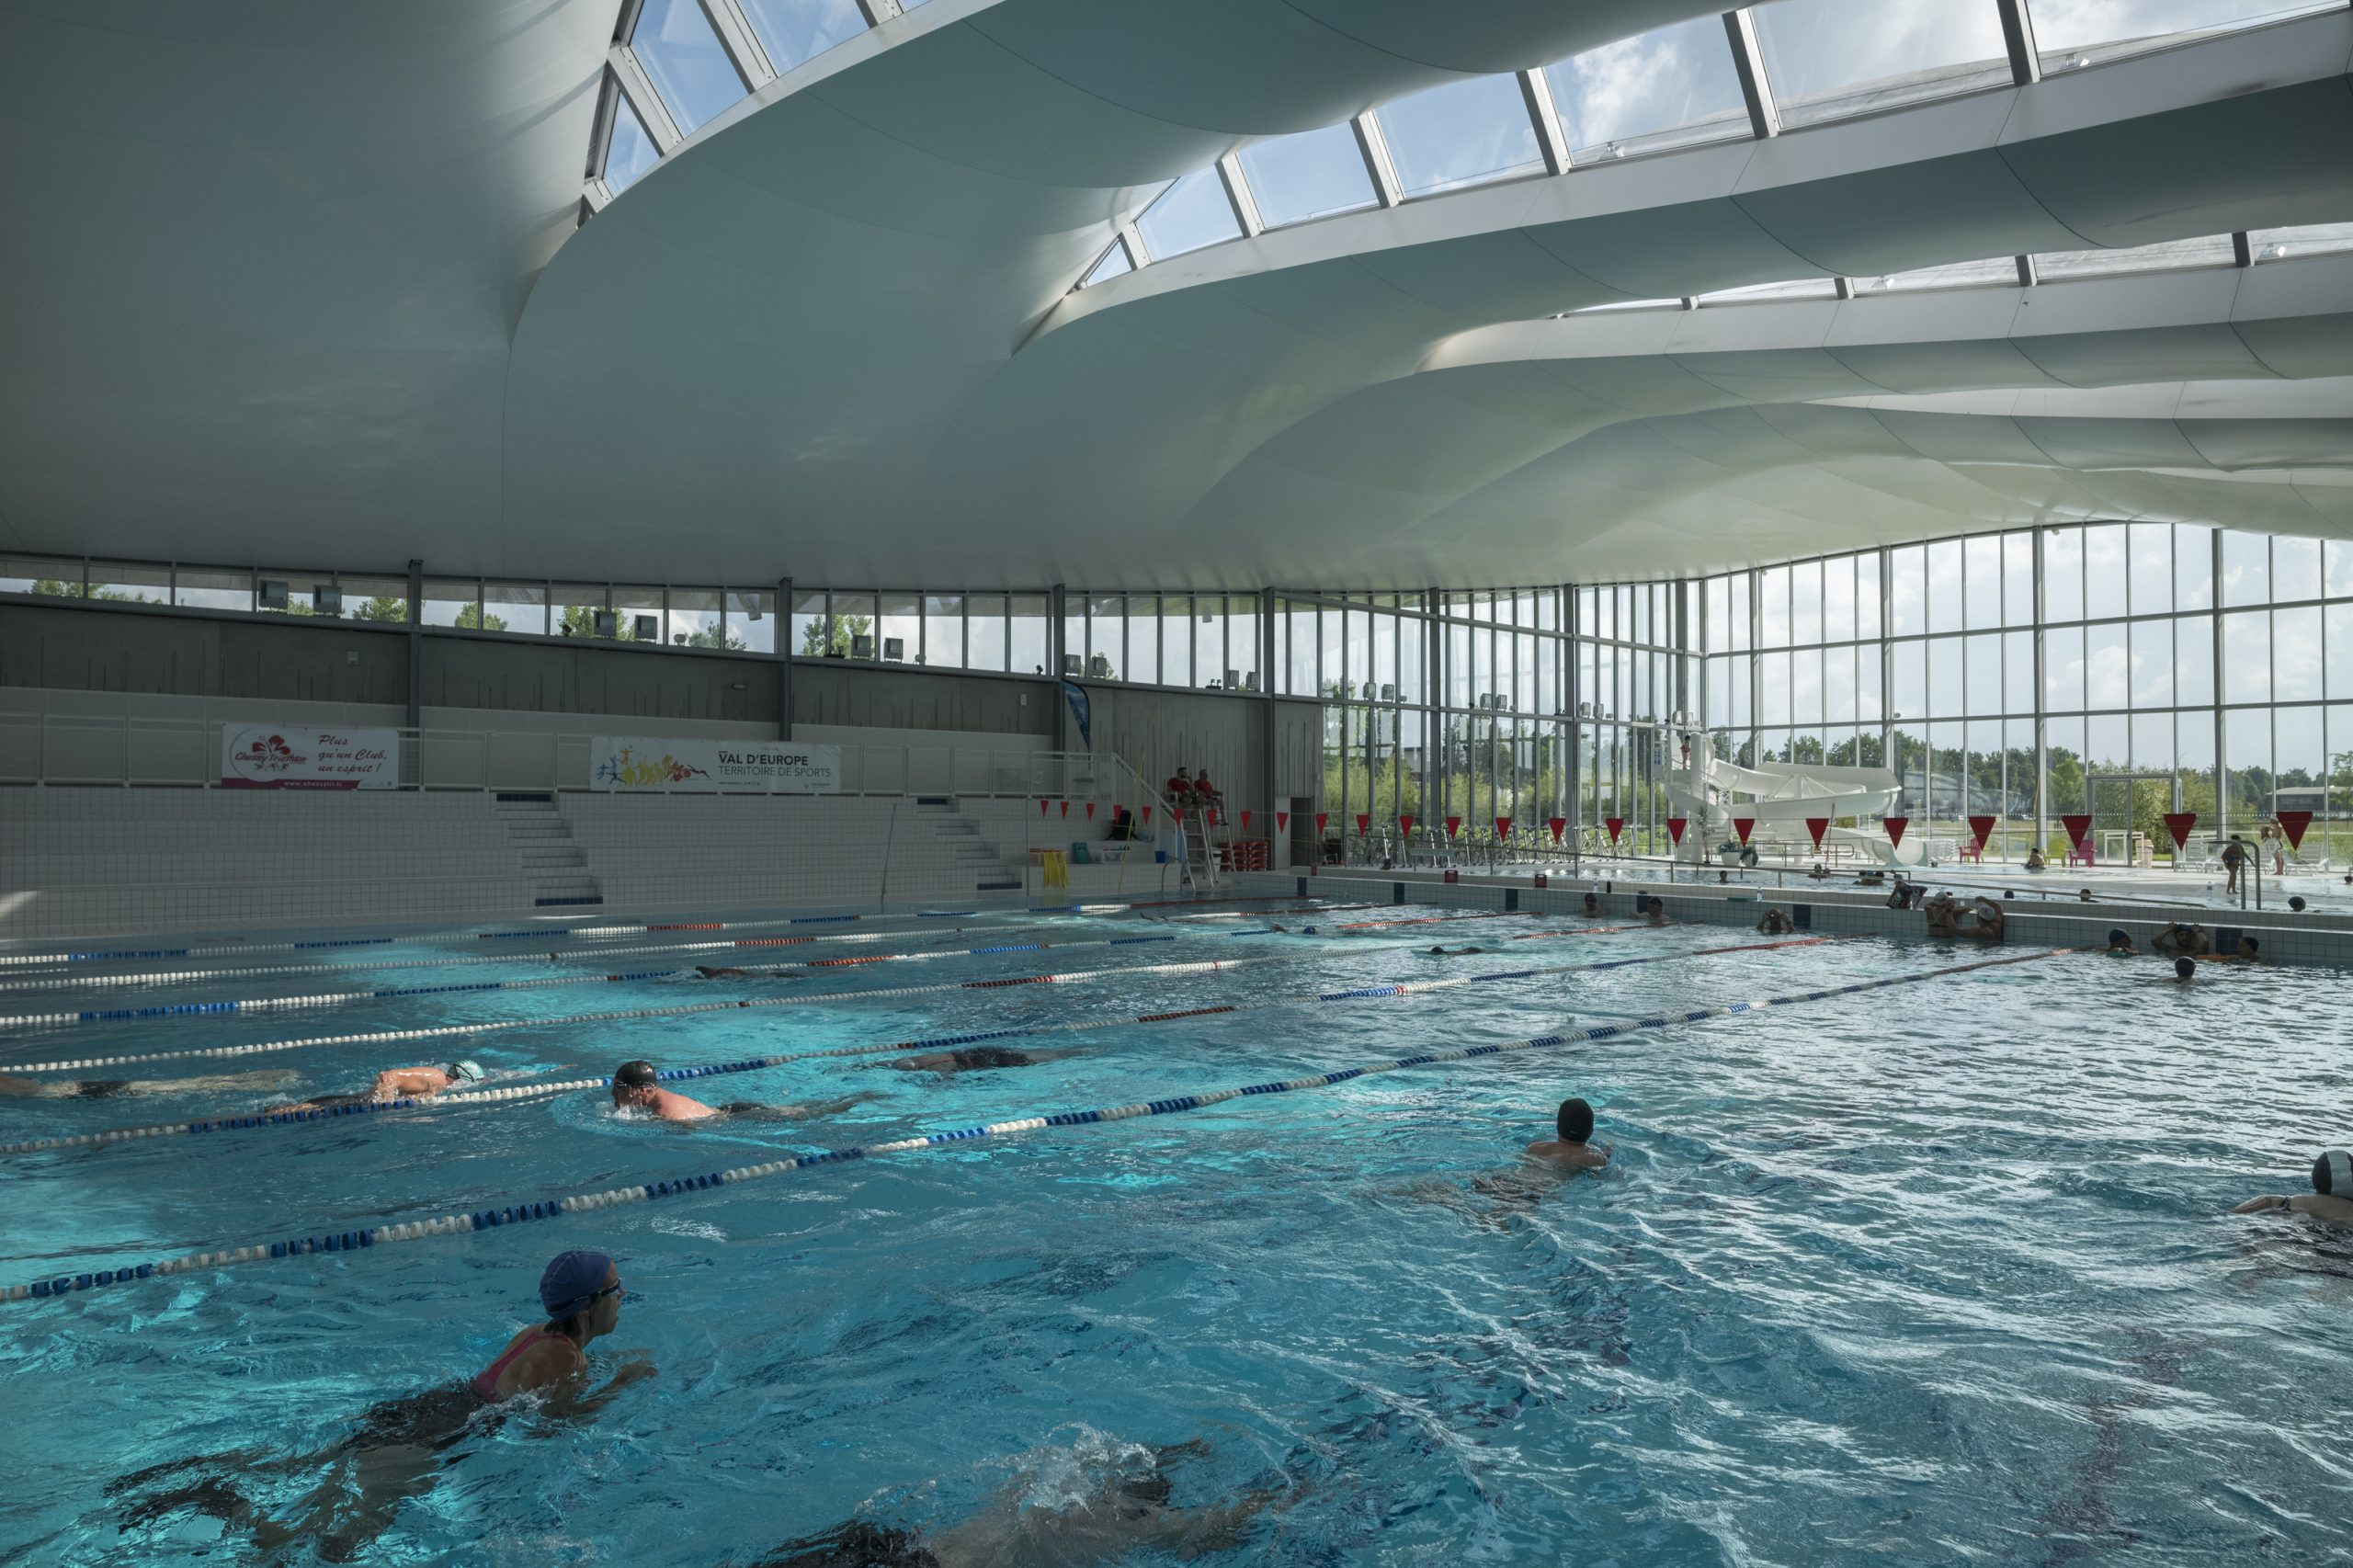 Horaire piscine herblay - Piscine maisons laffitte horaires ...